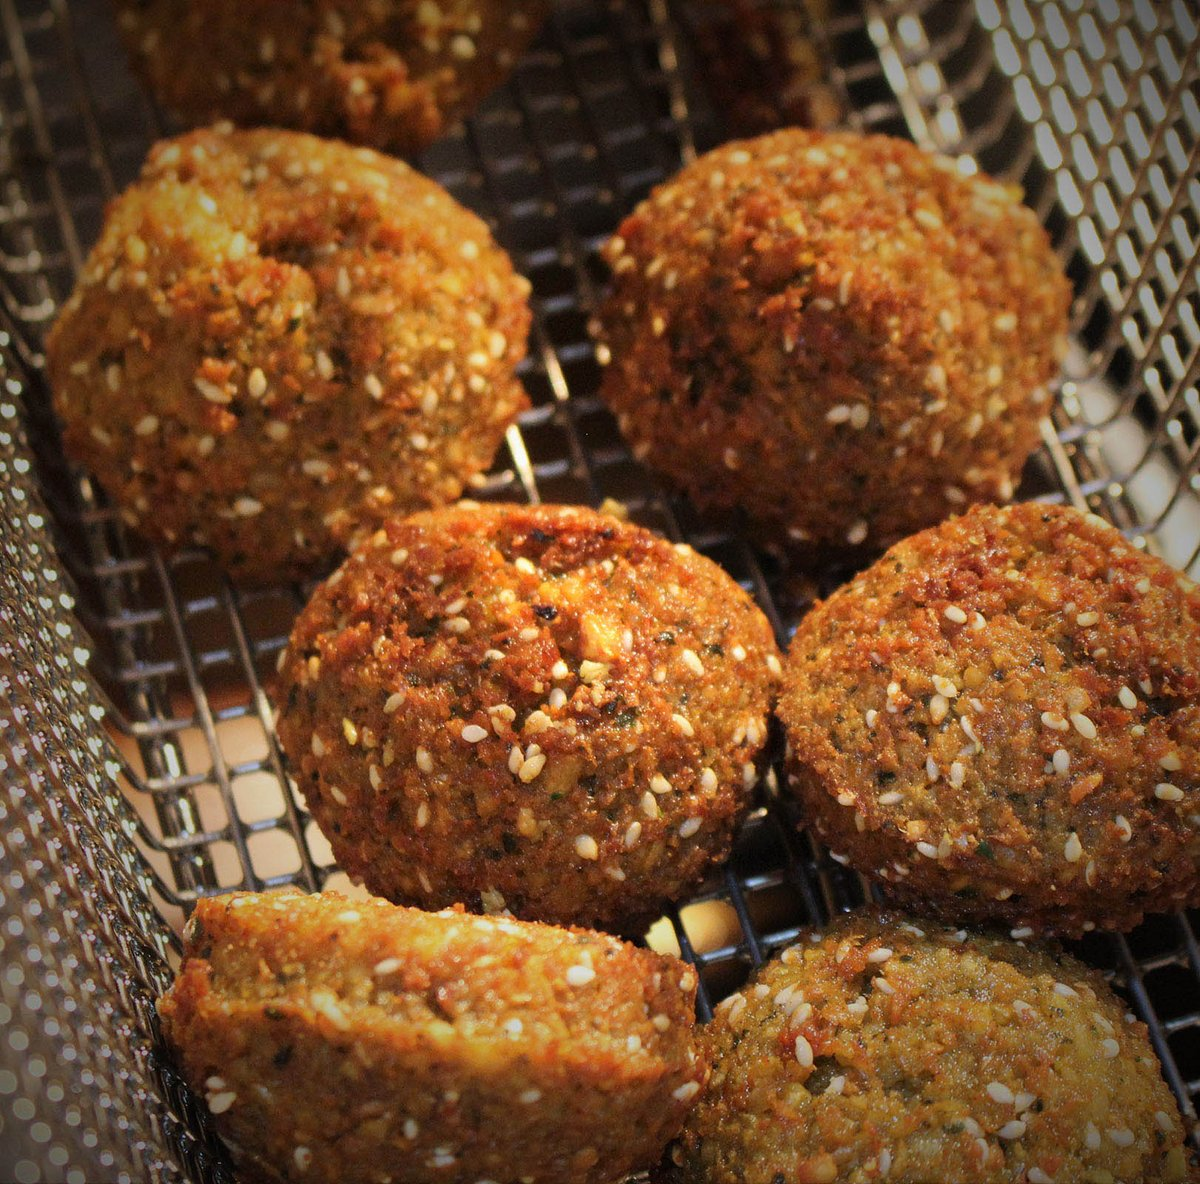 Lovely falafel #homemade #liverpool #boldstreet #independent #manchester #lebanese #lovefood #bakchich #vegan<br>http://pic.twitter.com/LDCyCWCrGh